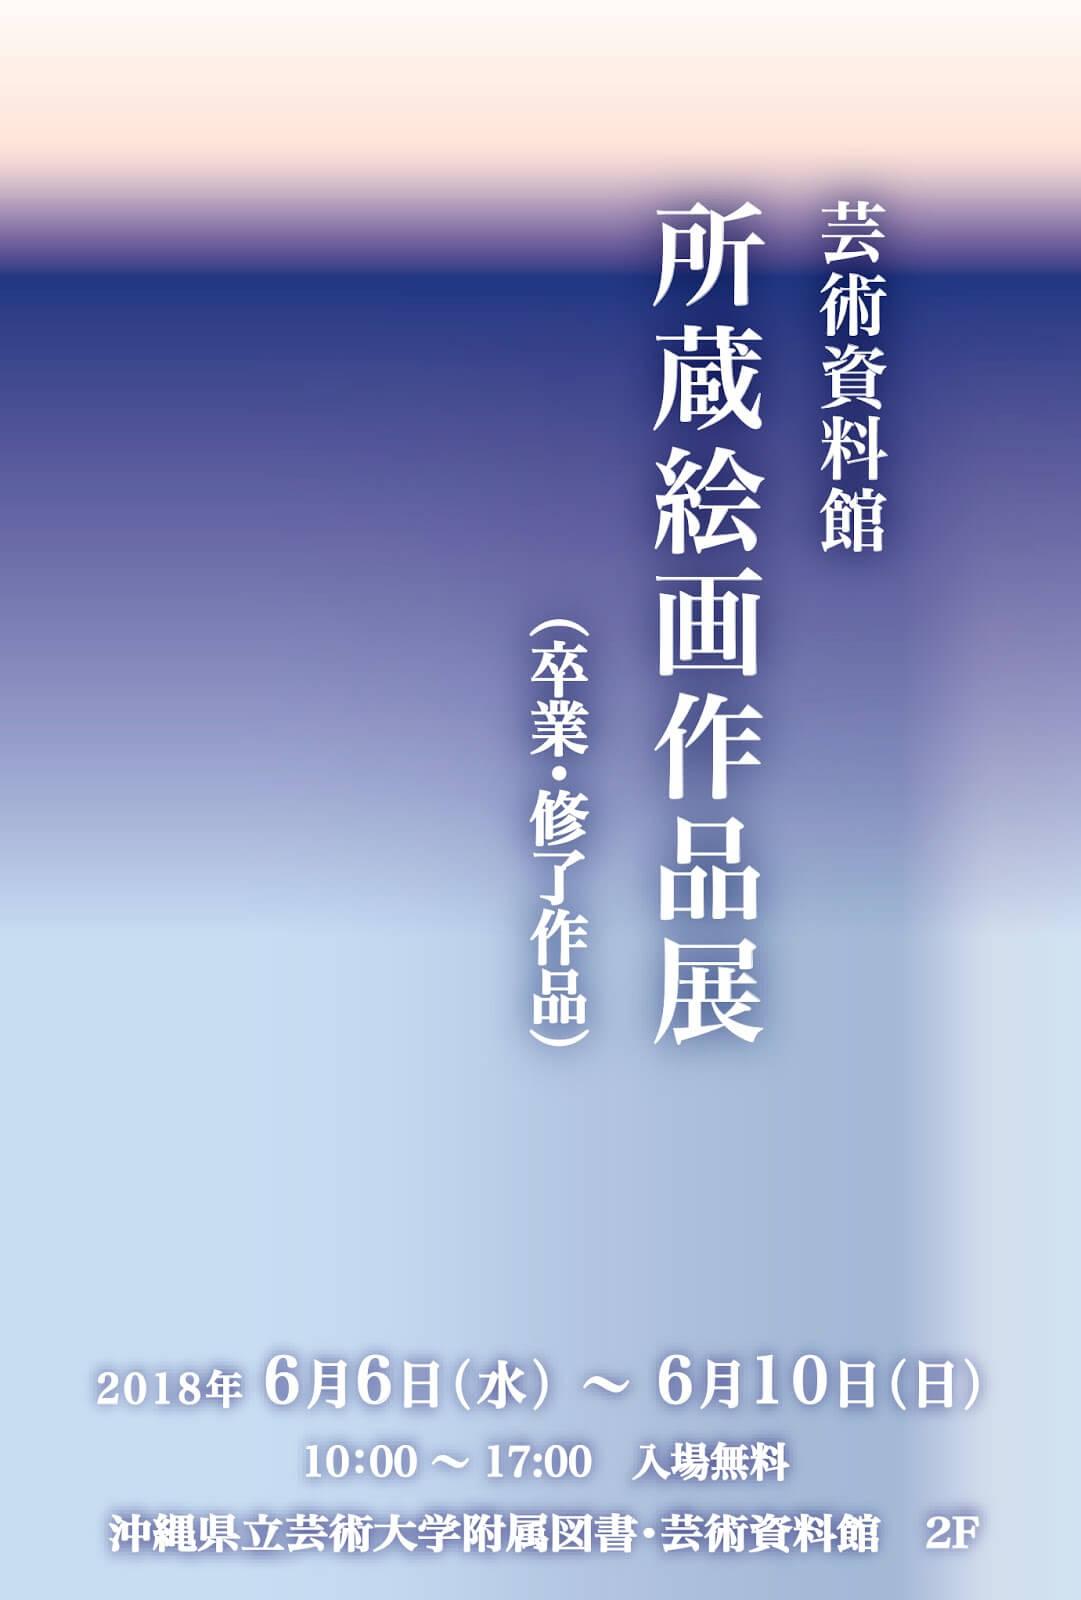 [フライヤー]芸術資料館 所蔵絵画作品展(卒業・修了作品)(表)